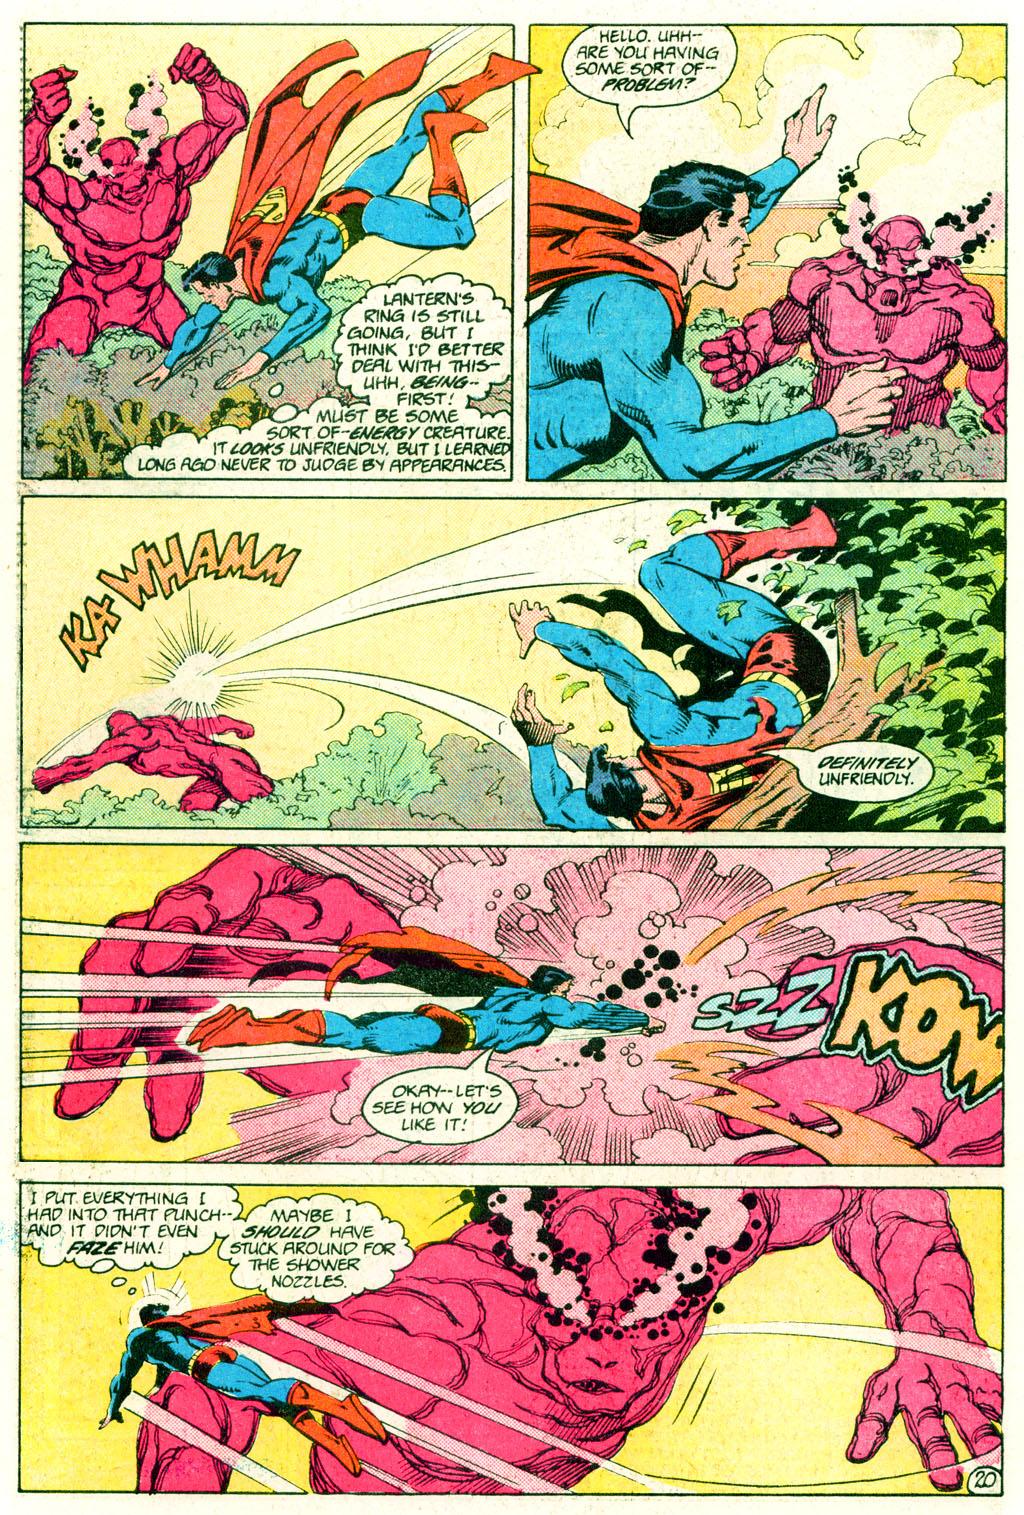 Action Comics (1938) 635 Page 19